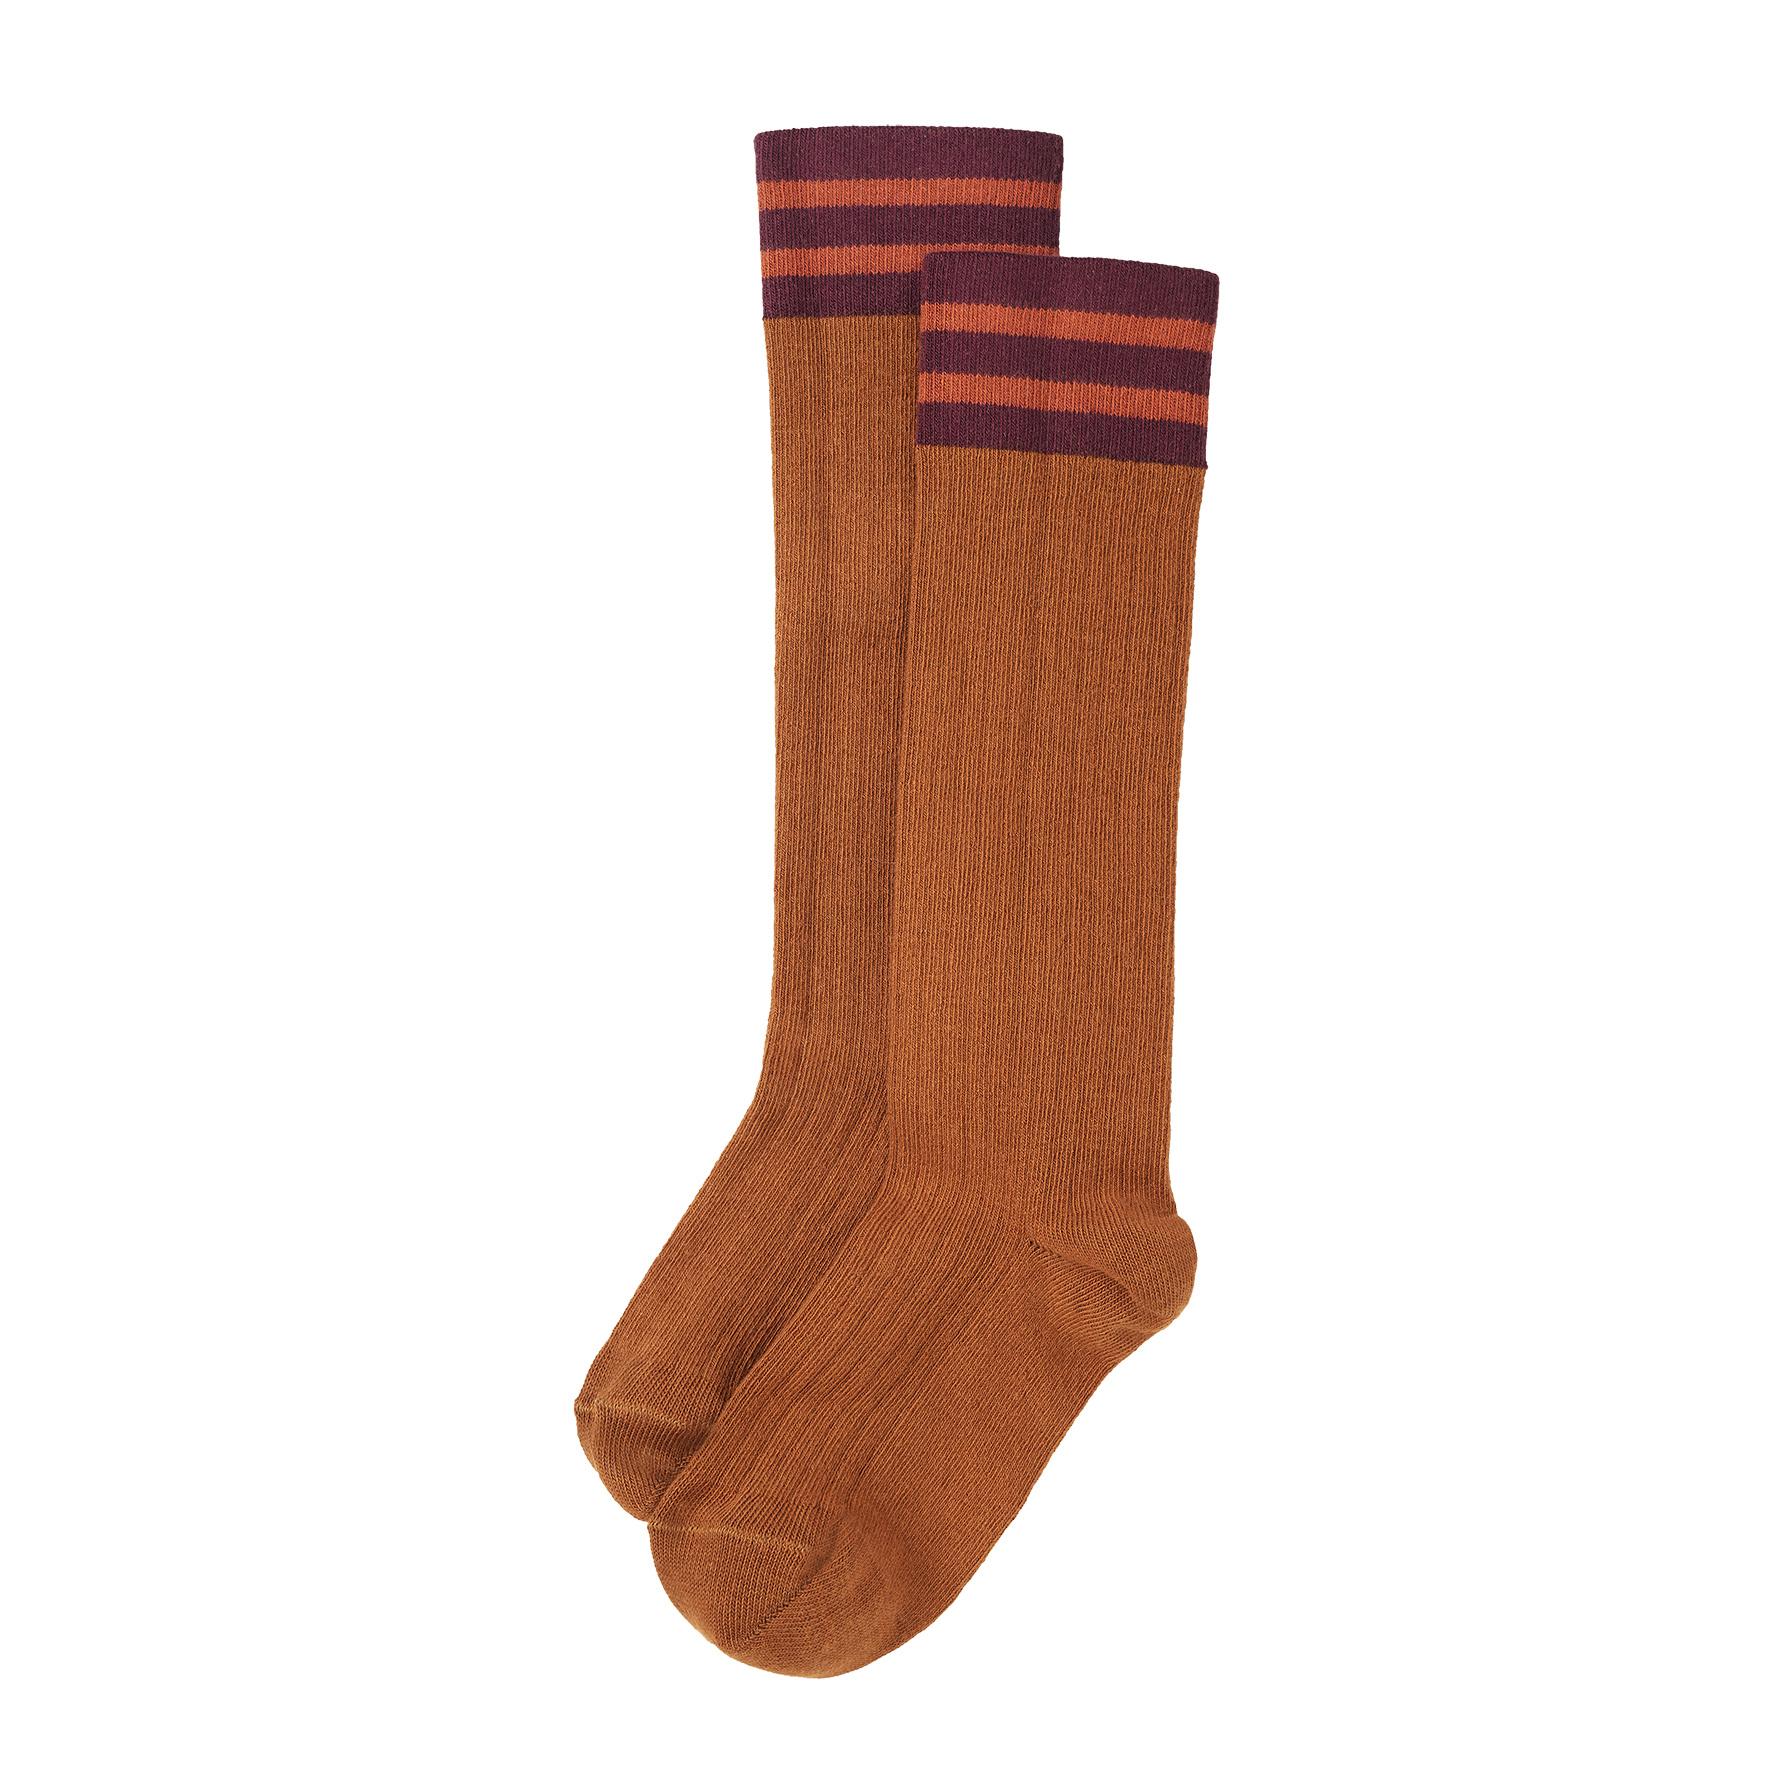 Mingo Knee socks rib   stripes light terracotta/plum/caramel